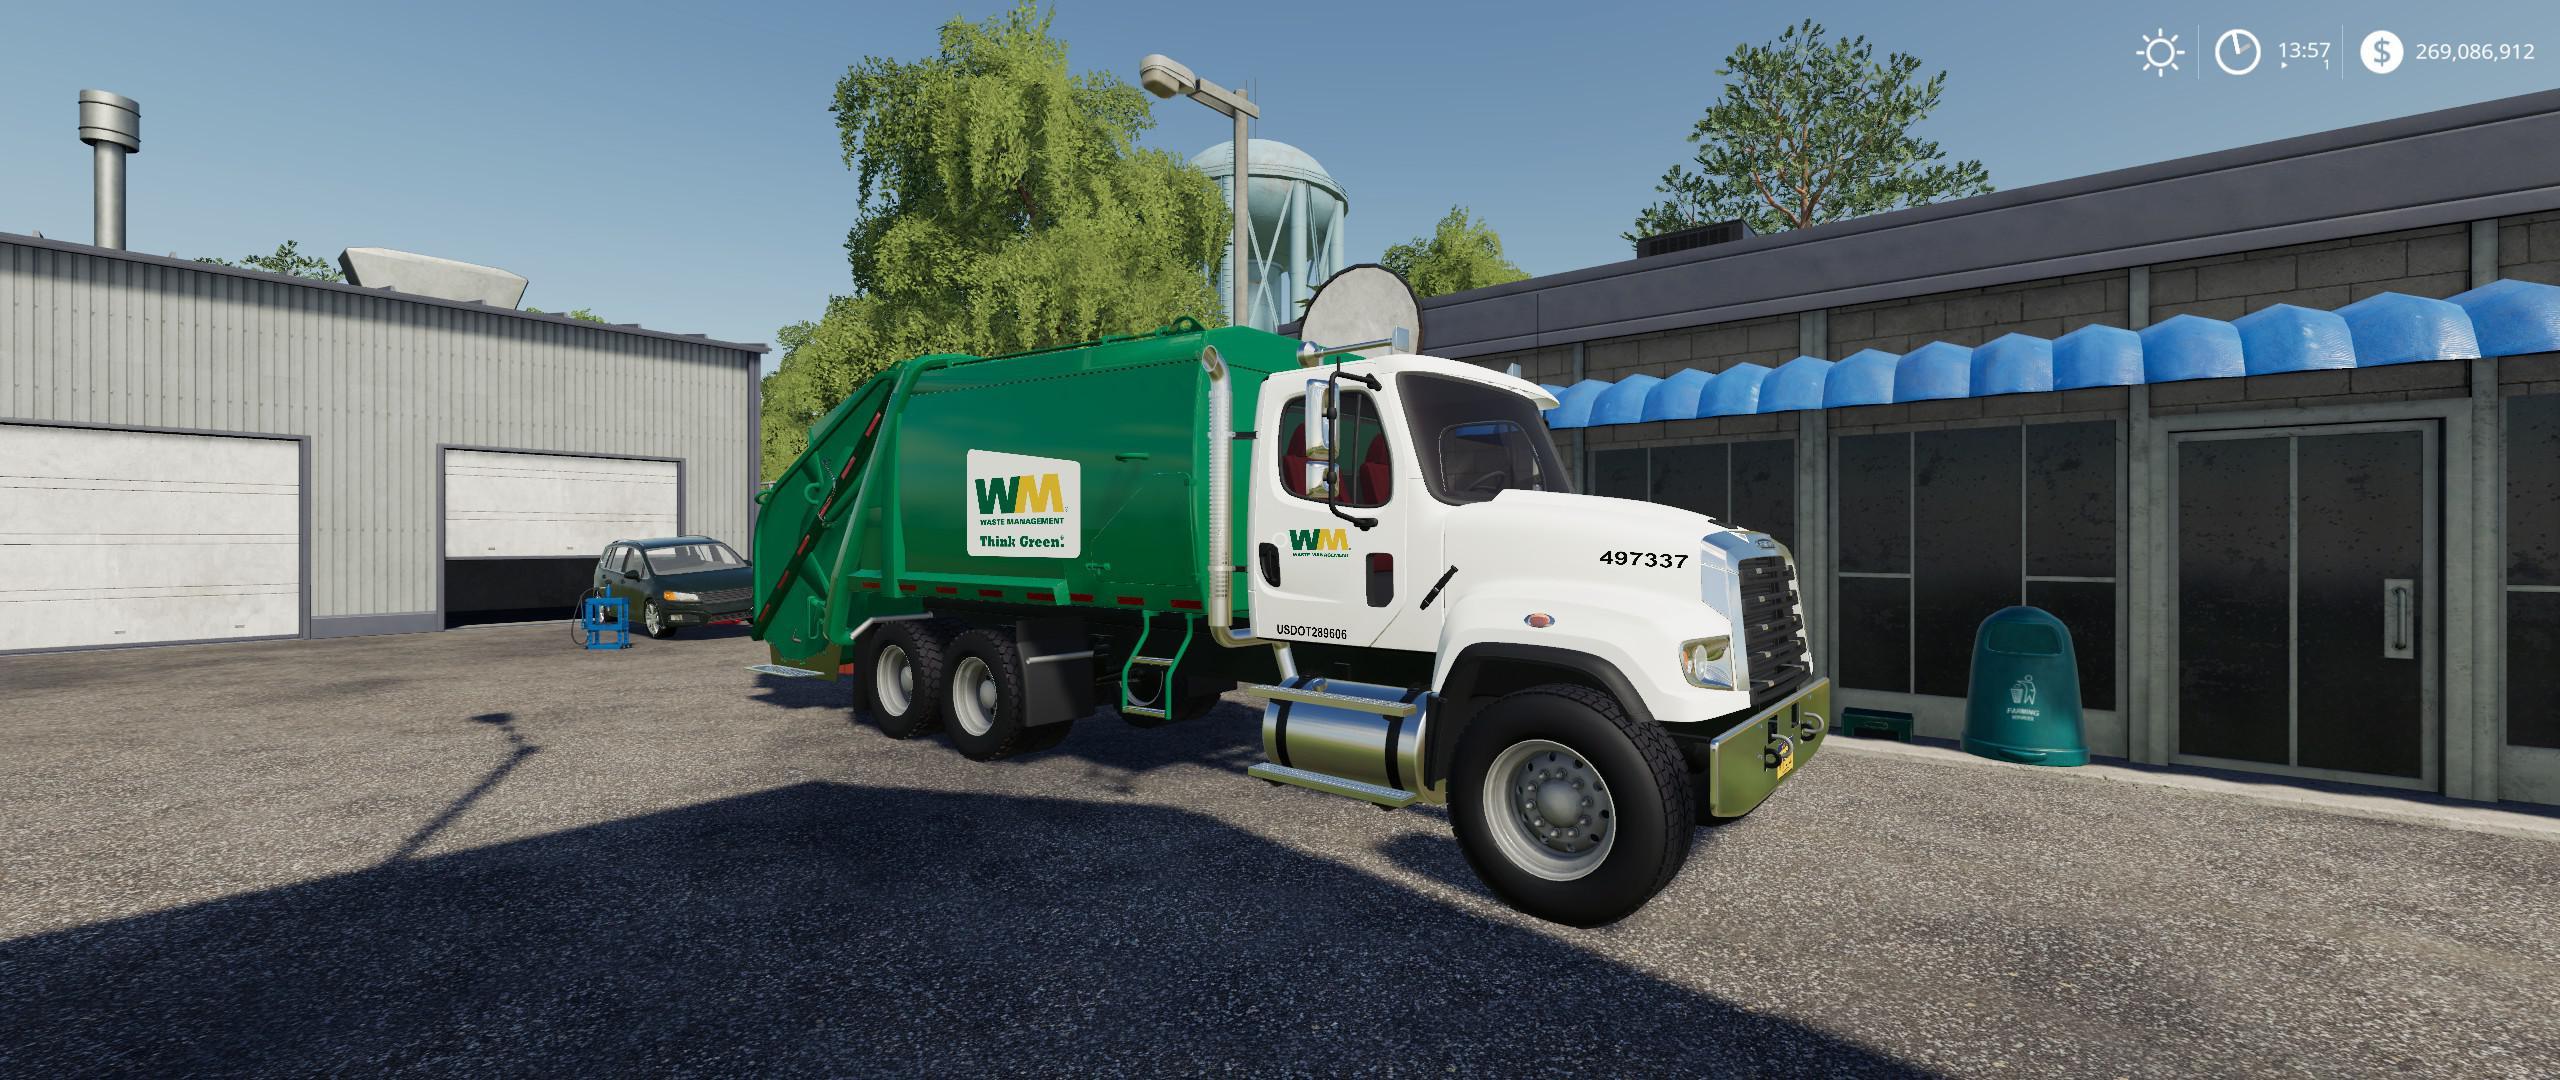 Freightliner F114SD Garbage Truck v1 0 0 0 FS19 - Farming